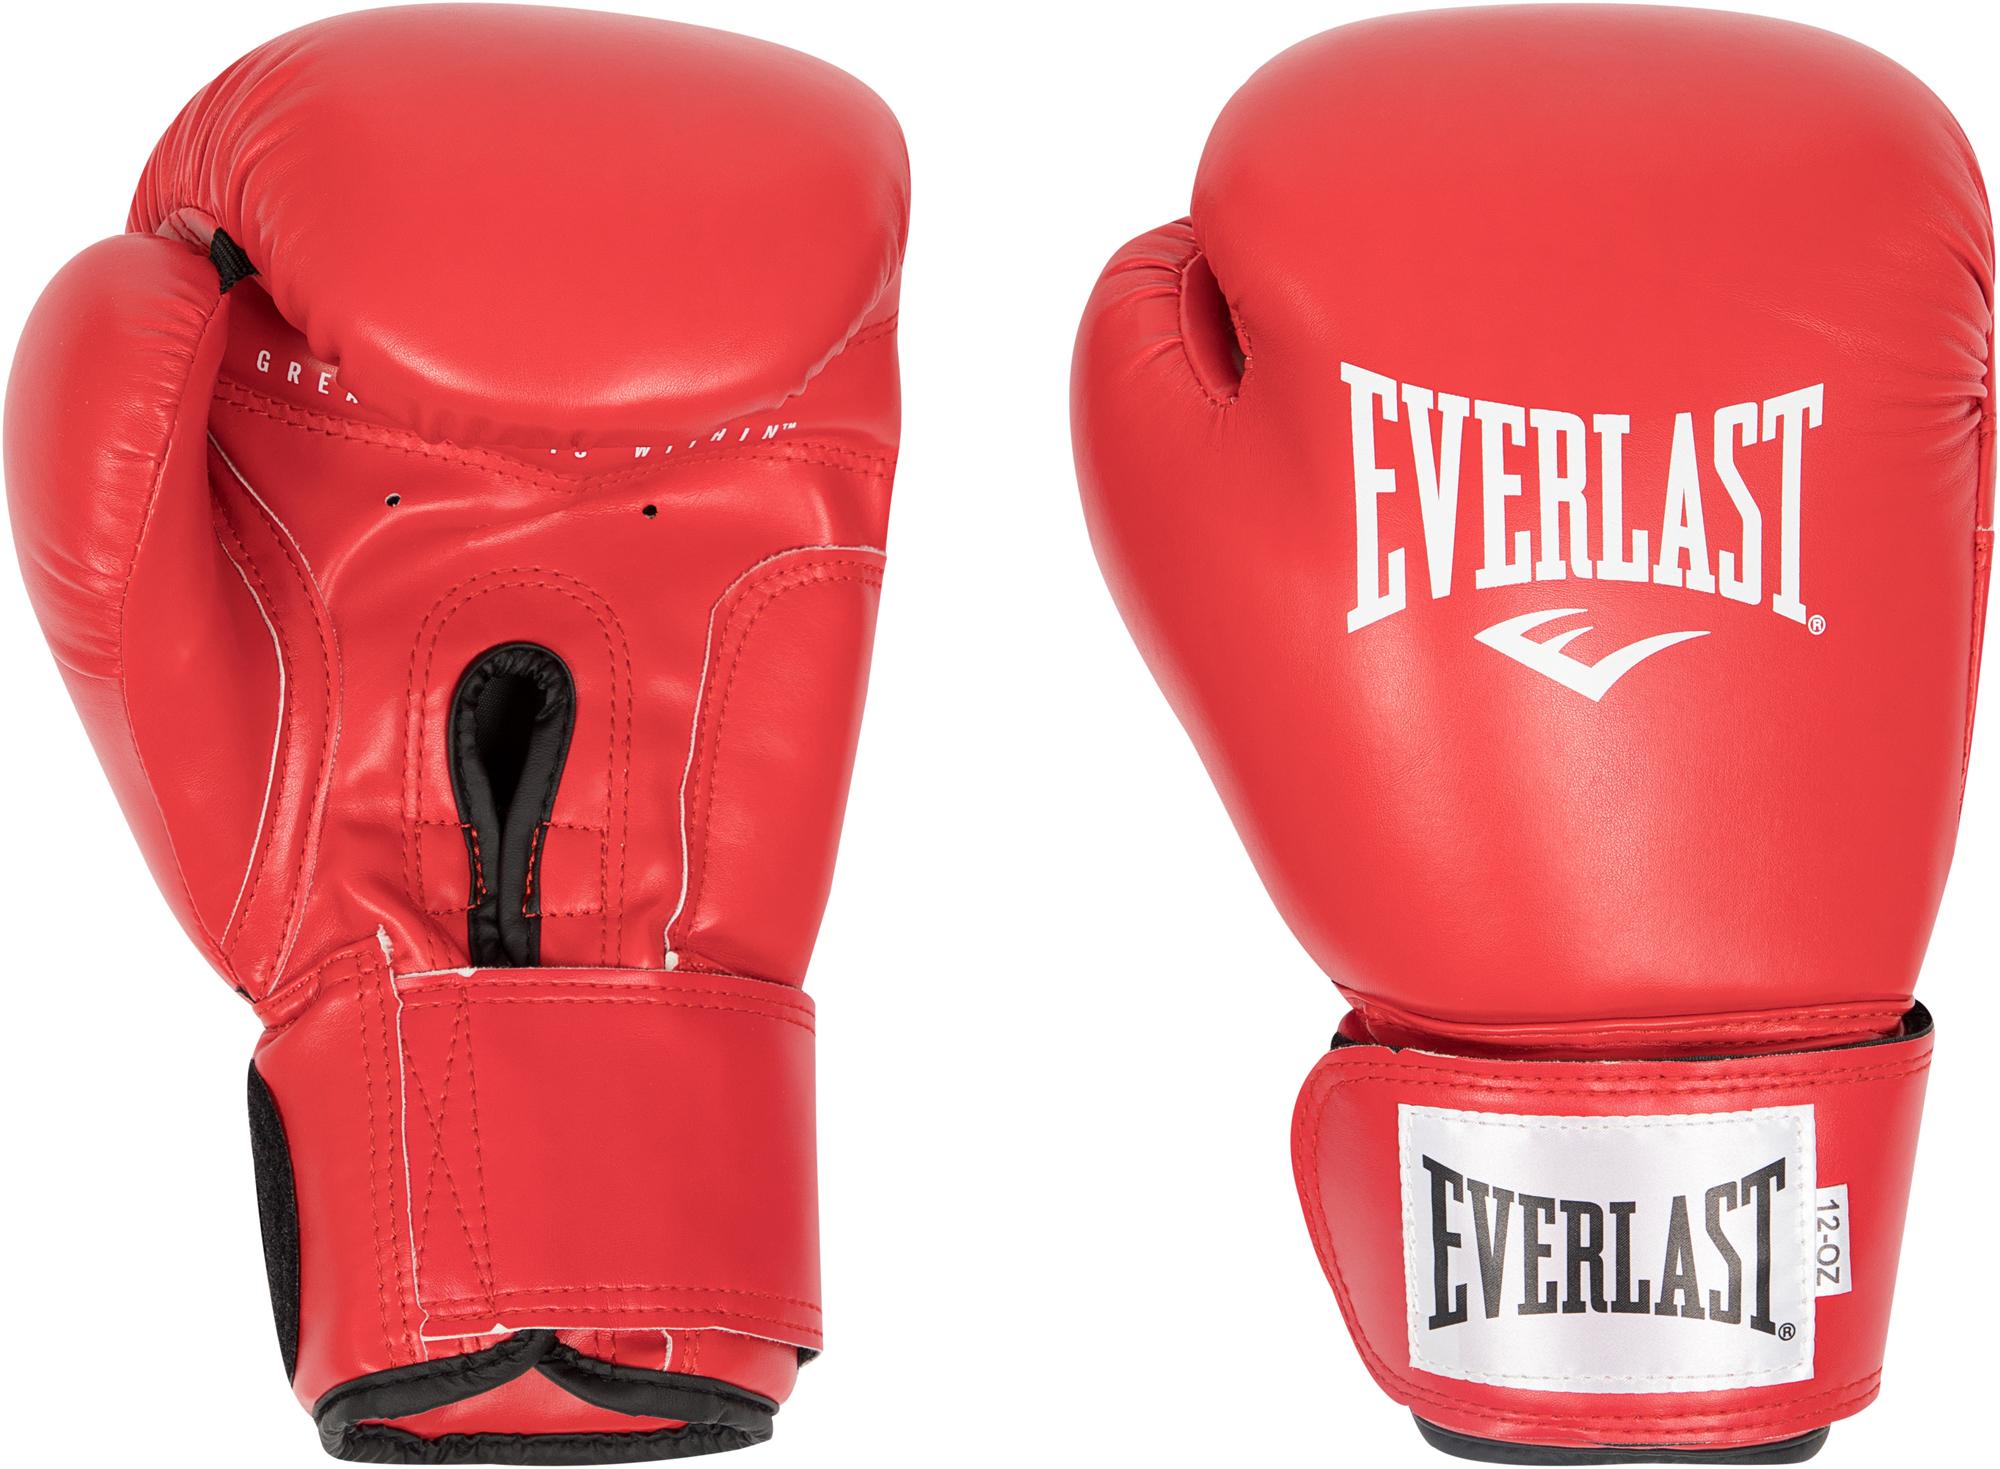 перчатки гелевые с бинтом everlast duster evergel цвет желтый длина бинта 150 см размер s m Everlast Перчатки боксерские Everlast Amateur Cometition PU, размер 12